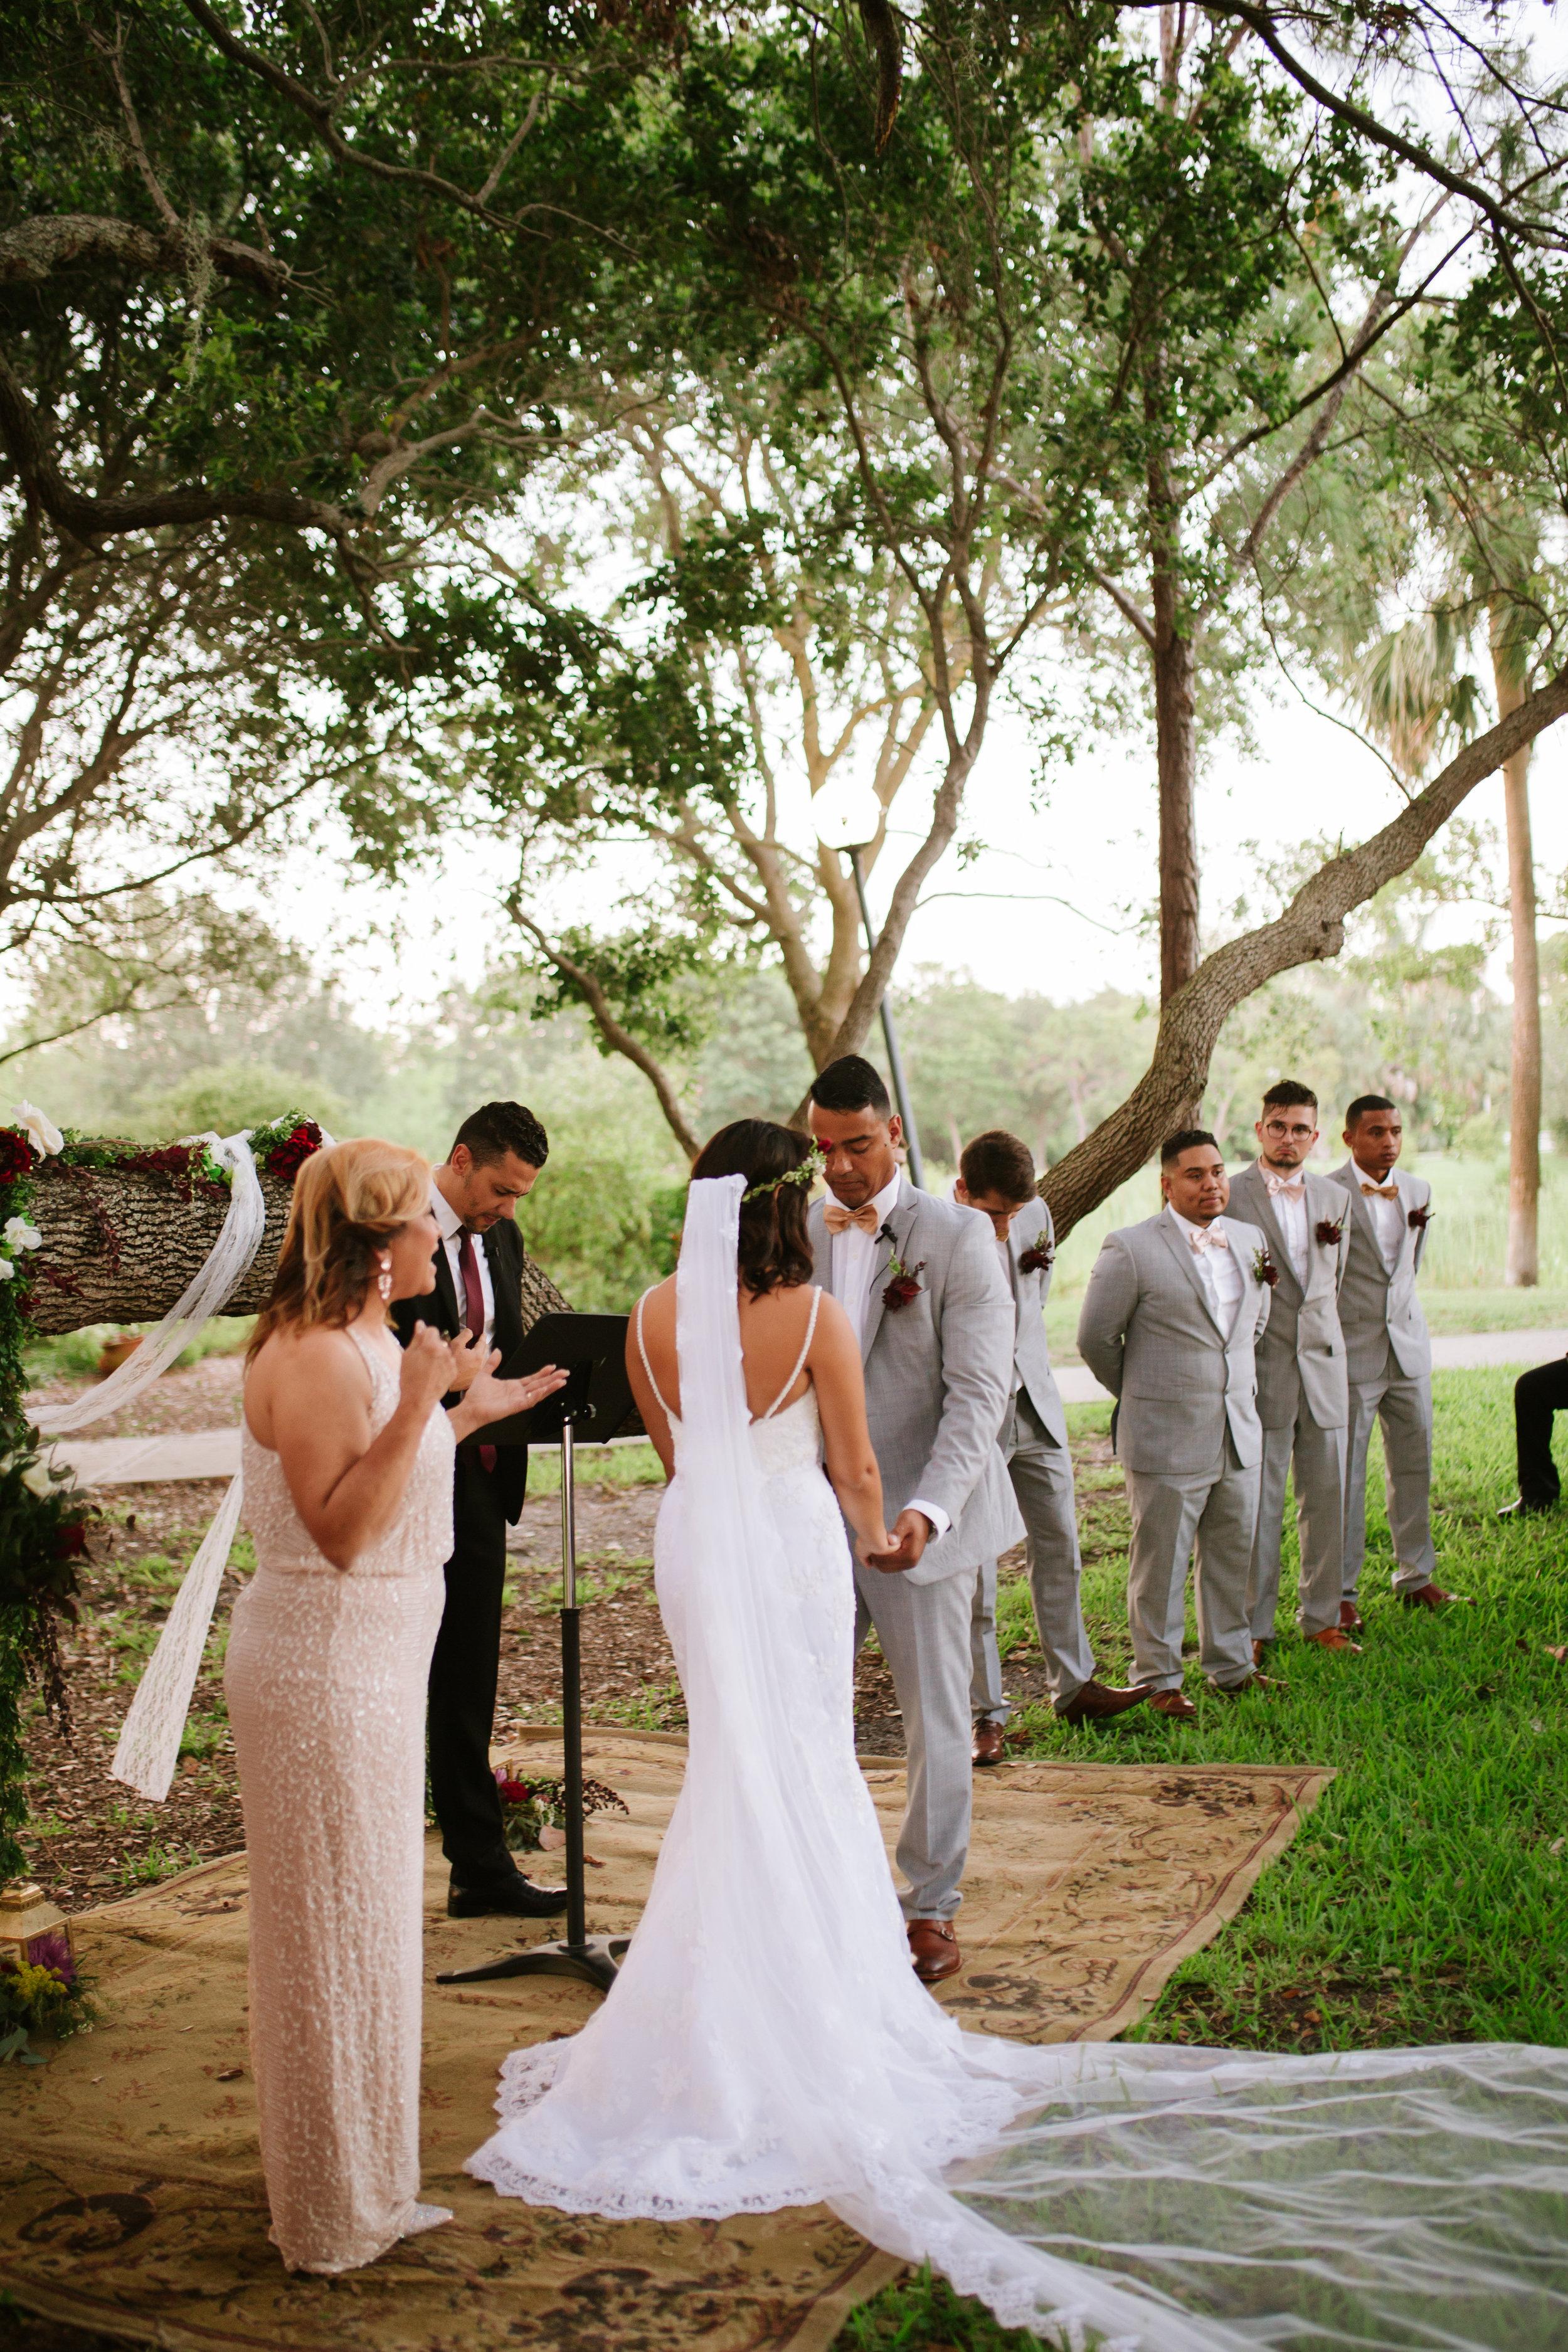 2017.05.23 Barbara and Mauricio Sales Port St Lucie Wedding (377 of 772).jpg